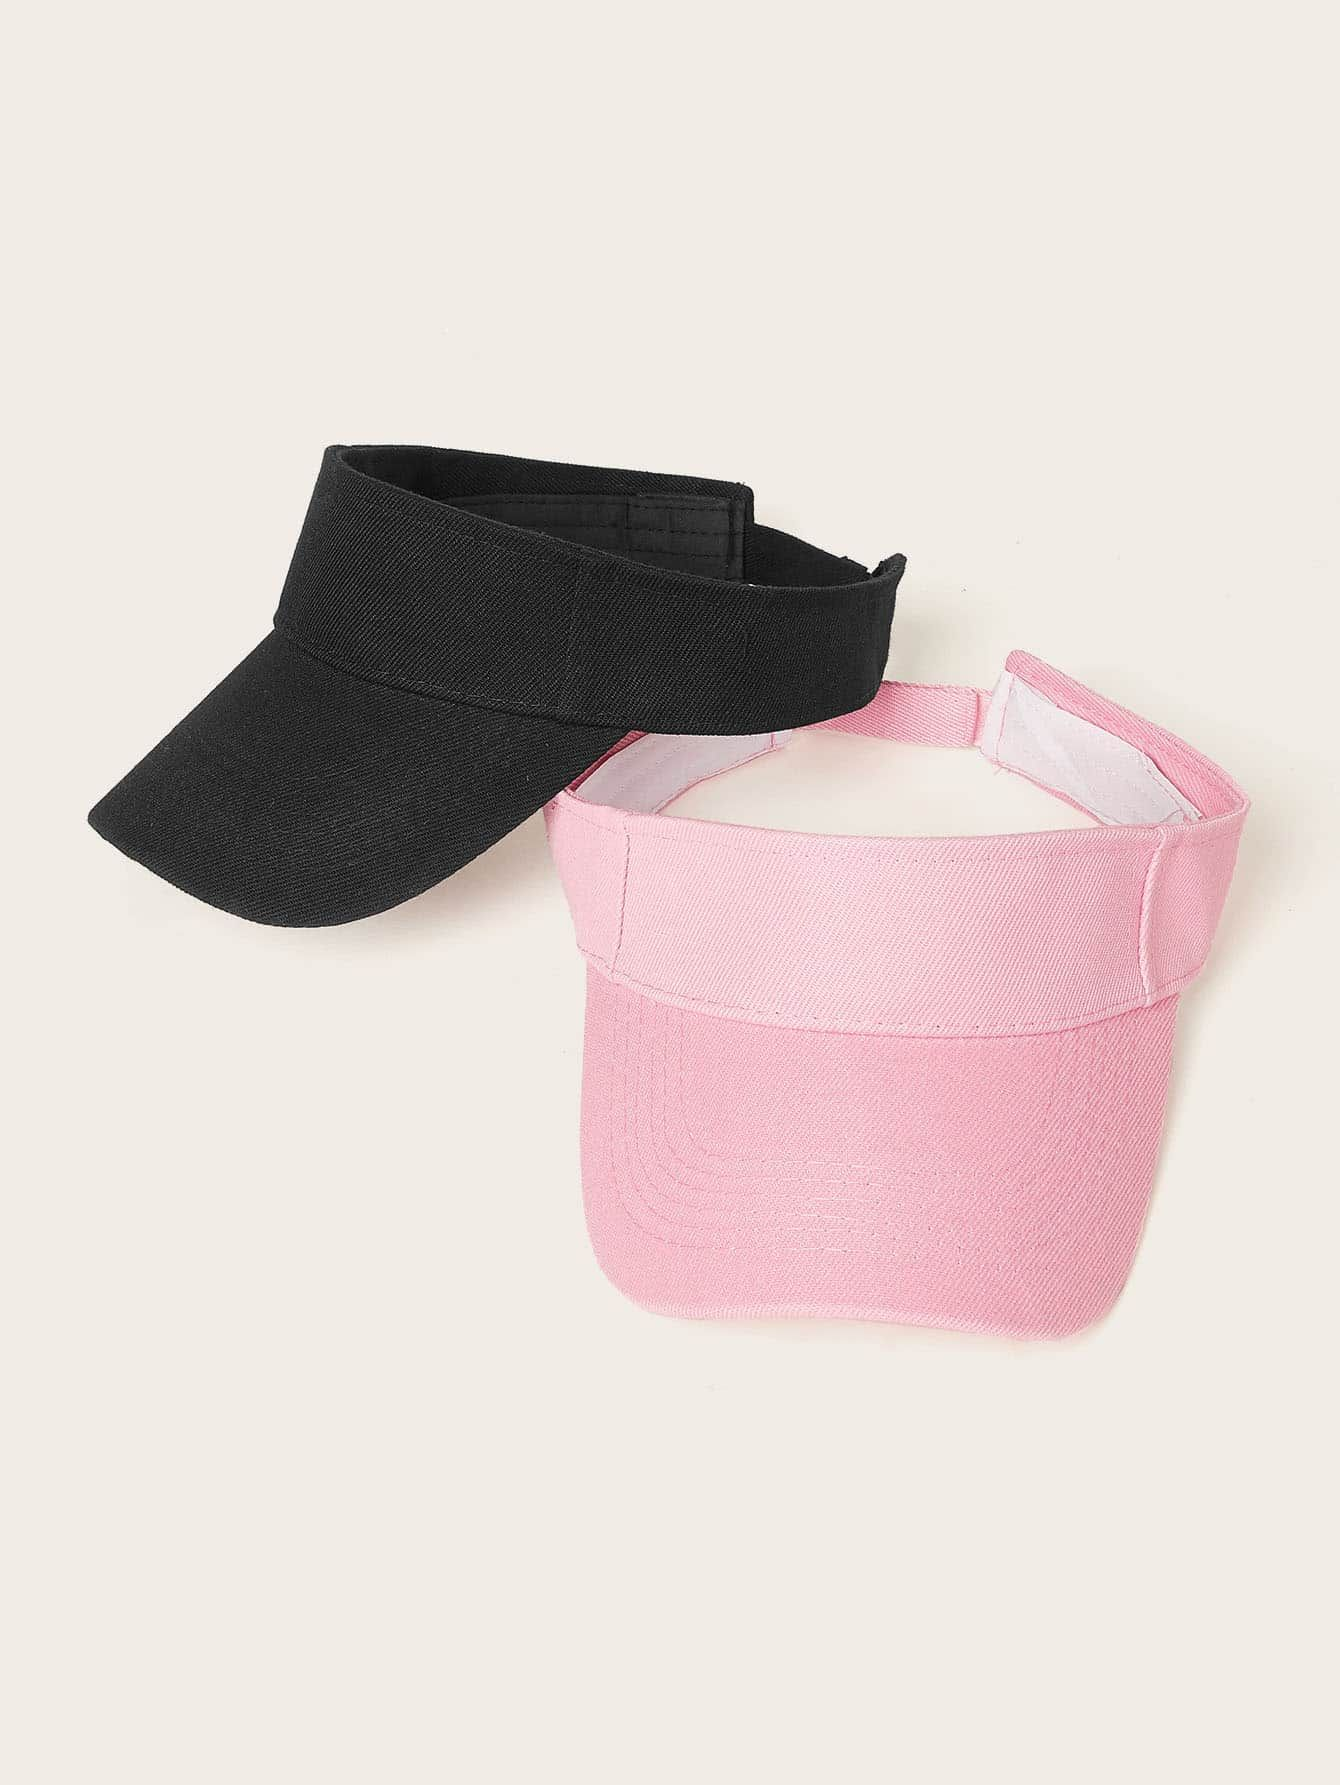 2pcs Solid Visor Hat SHEIN USA in 2020 Visor hats